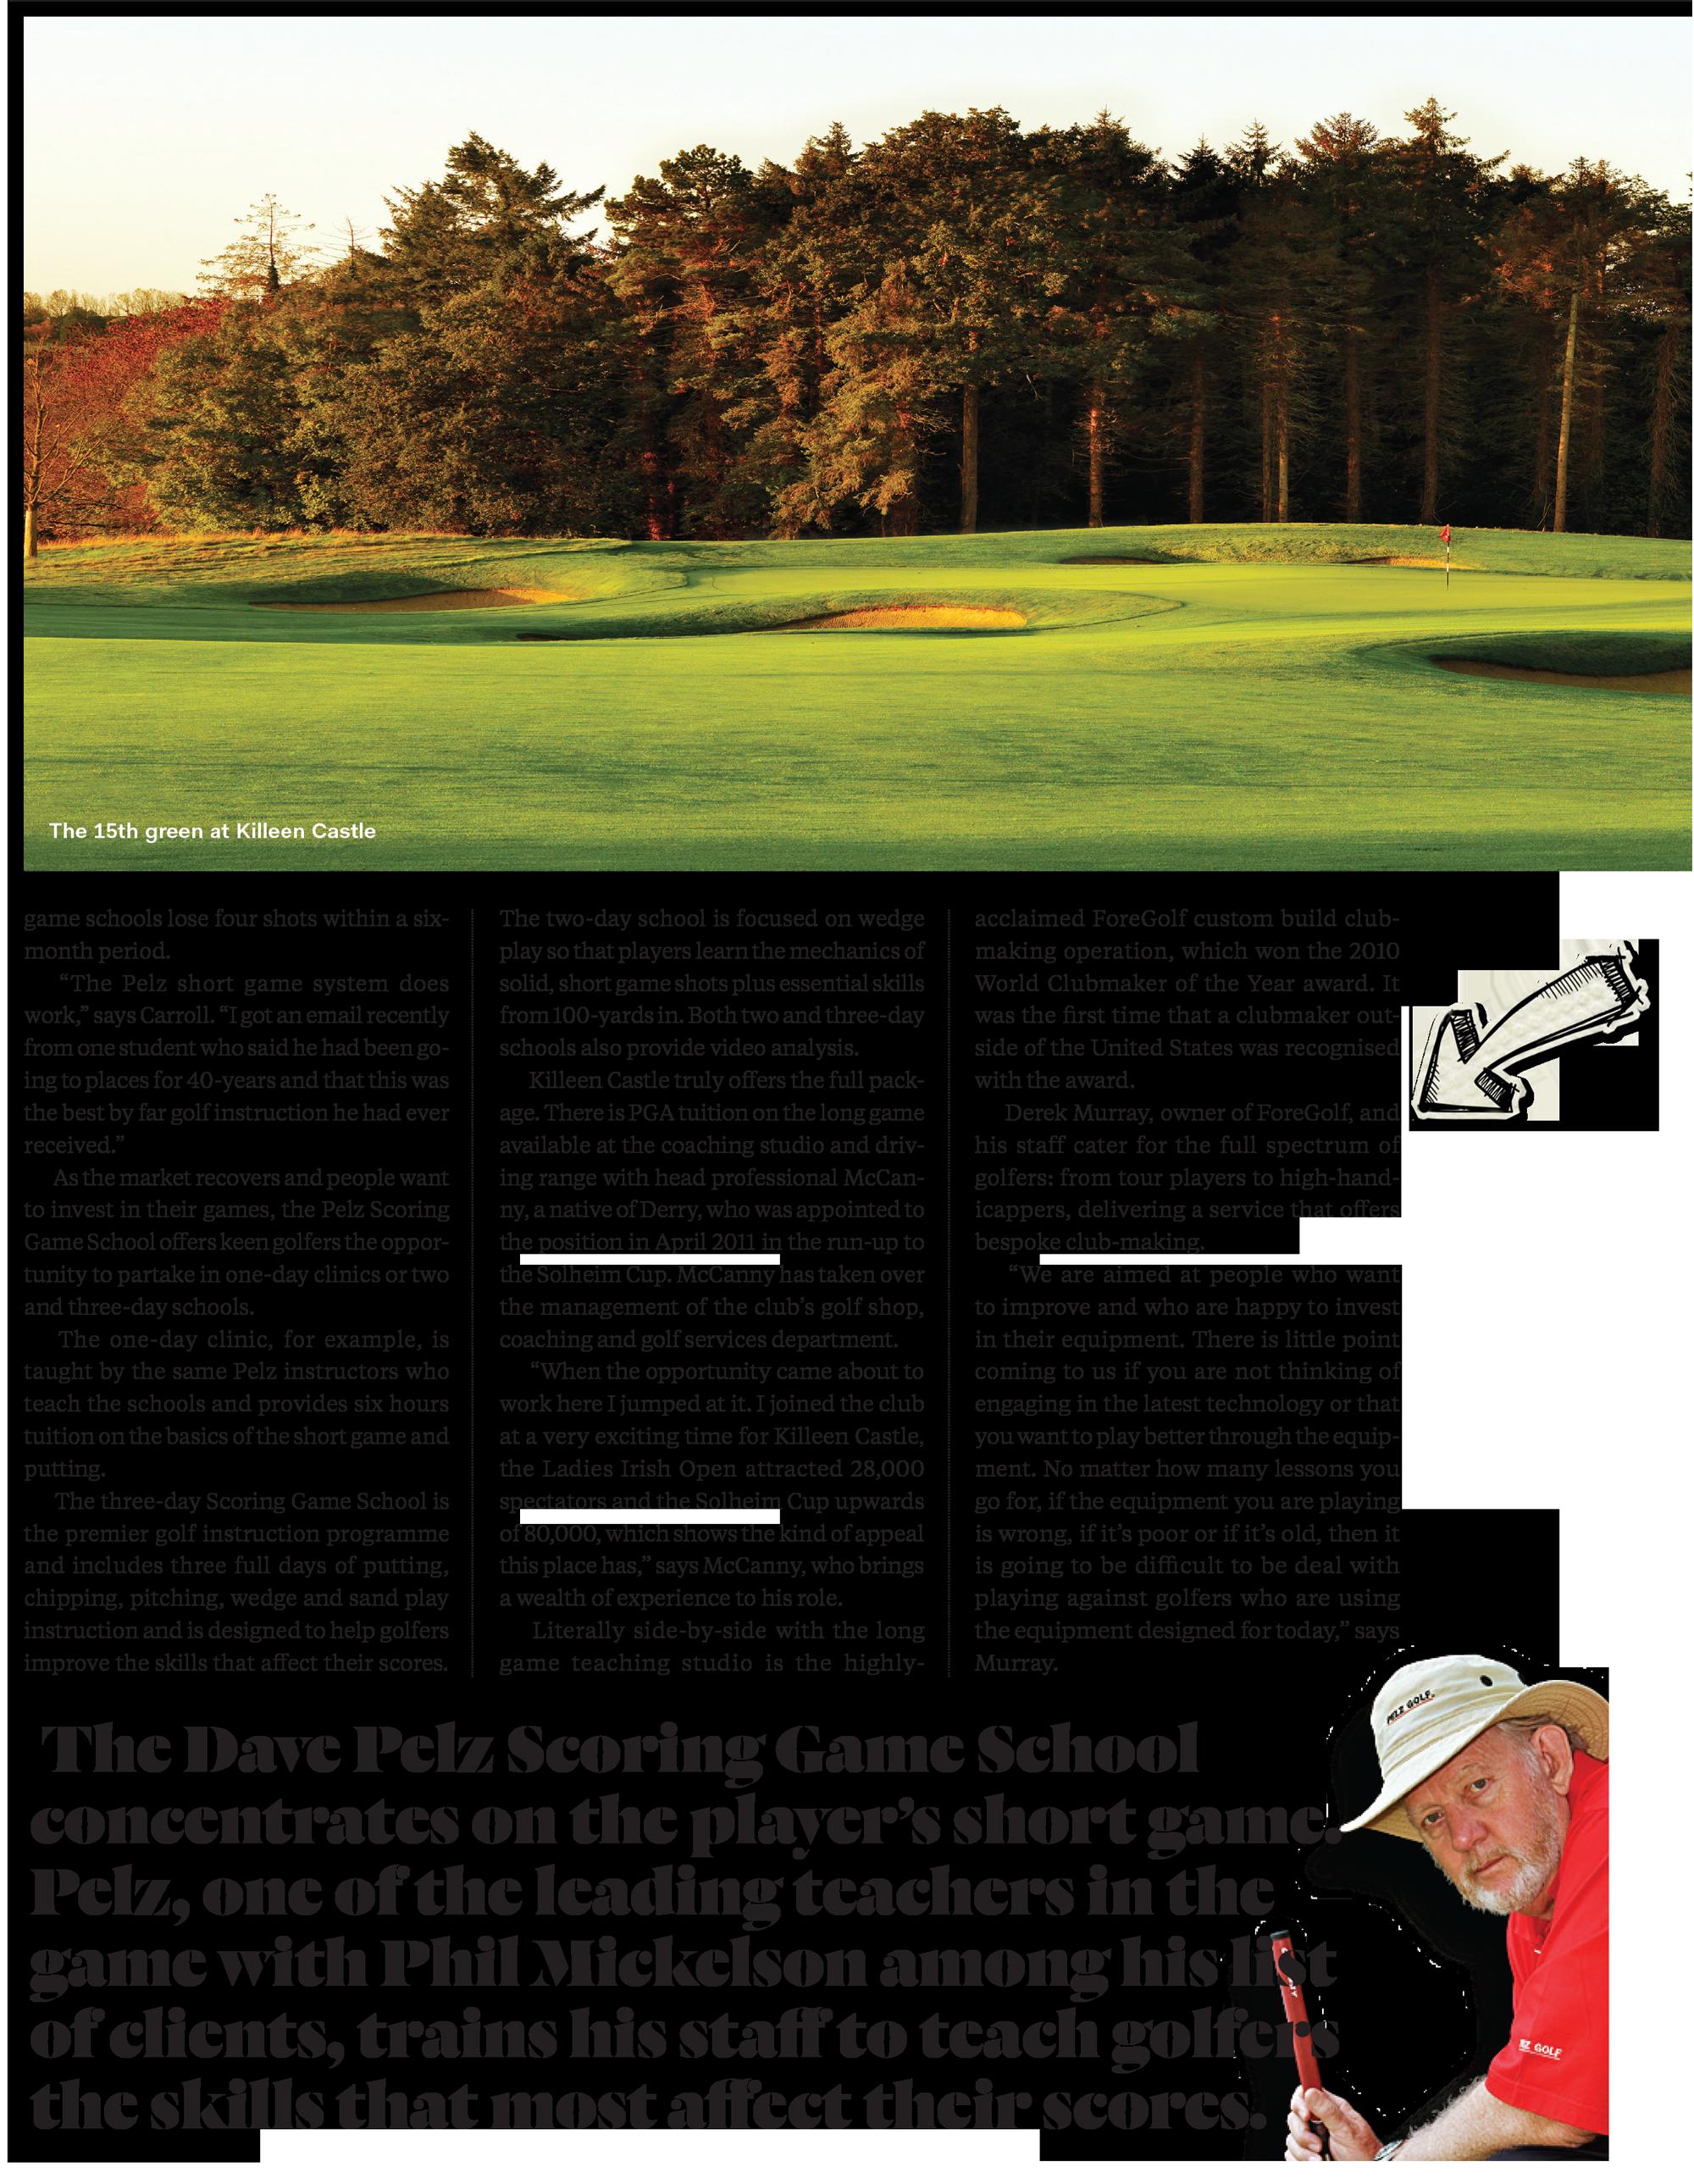 Golf Digest Ireland July Killeen Castle Pelz ForeGolf 1